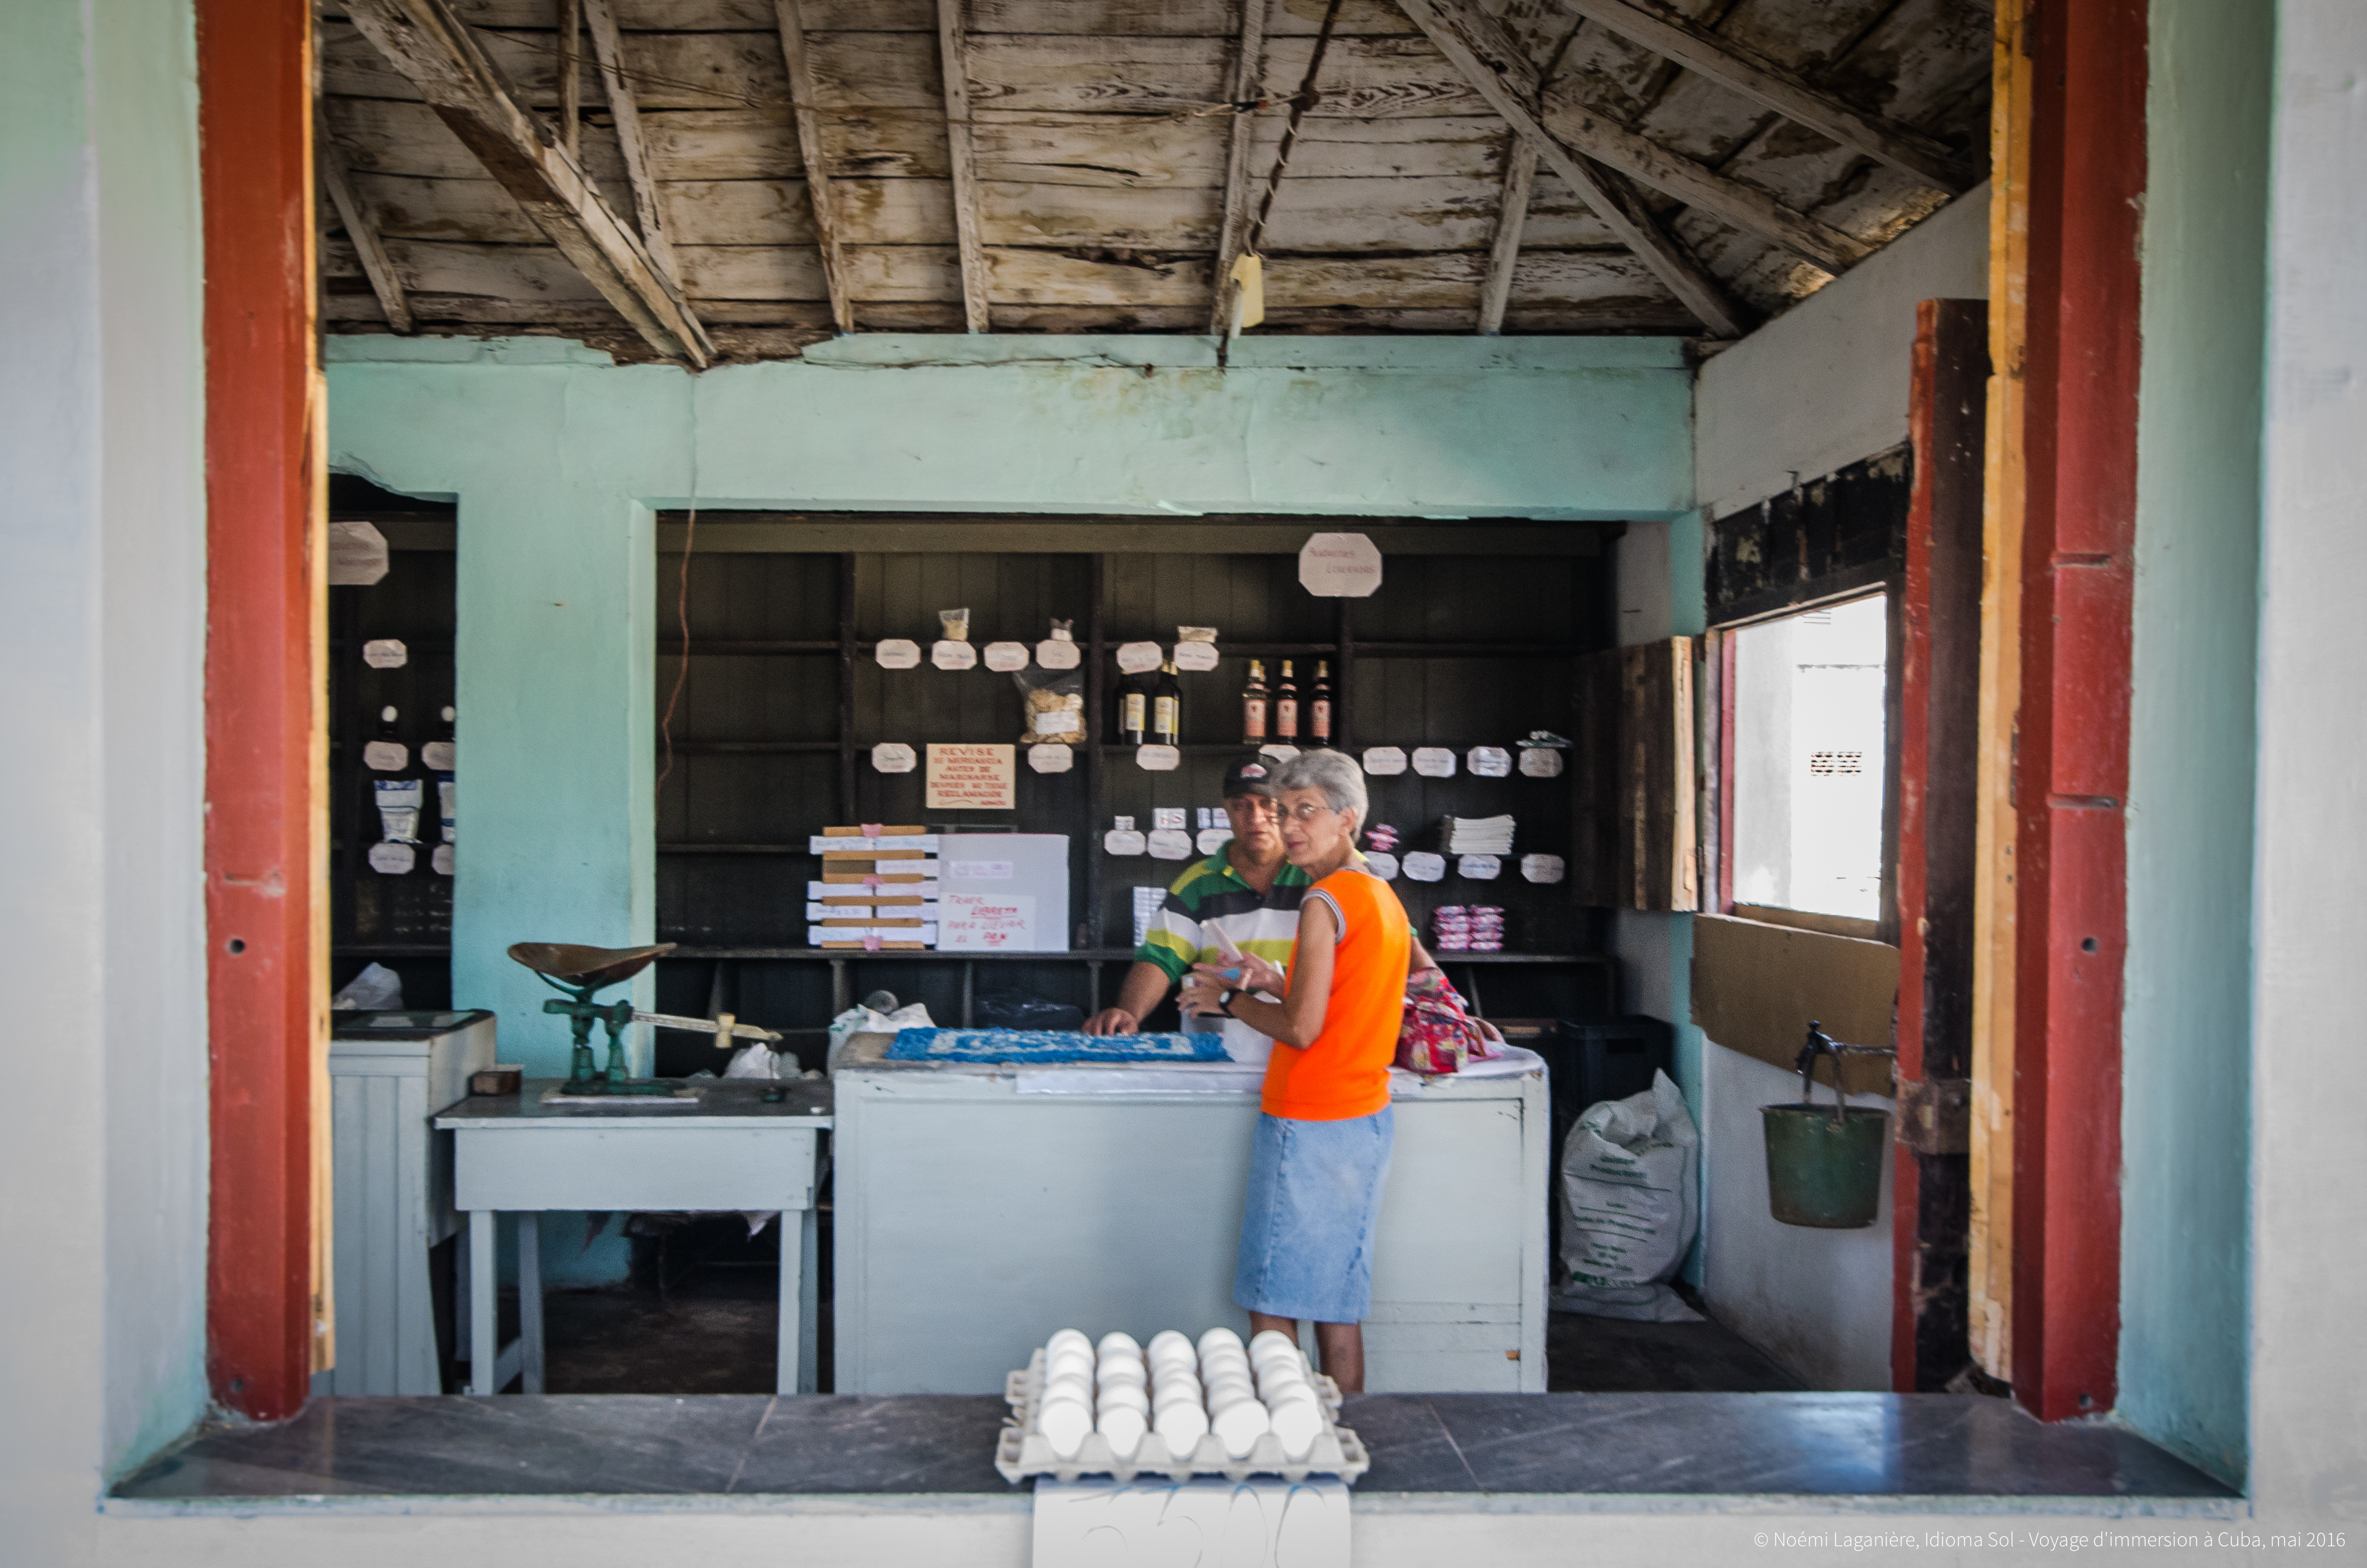 Idioma Sol - Voyage d'immersion, Santa-Cruz del Norte, Cuba, Mai 2016